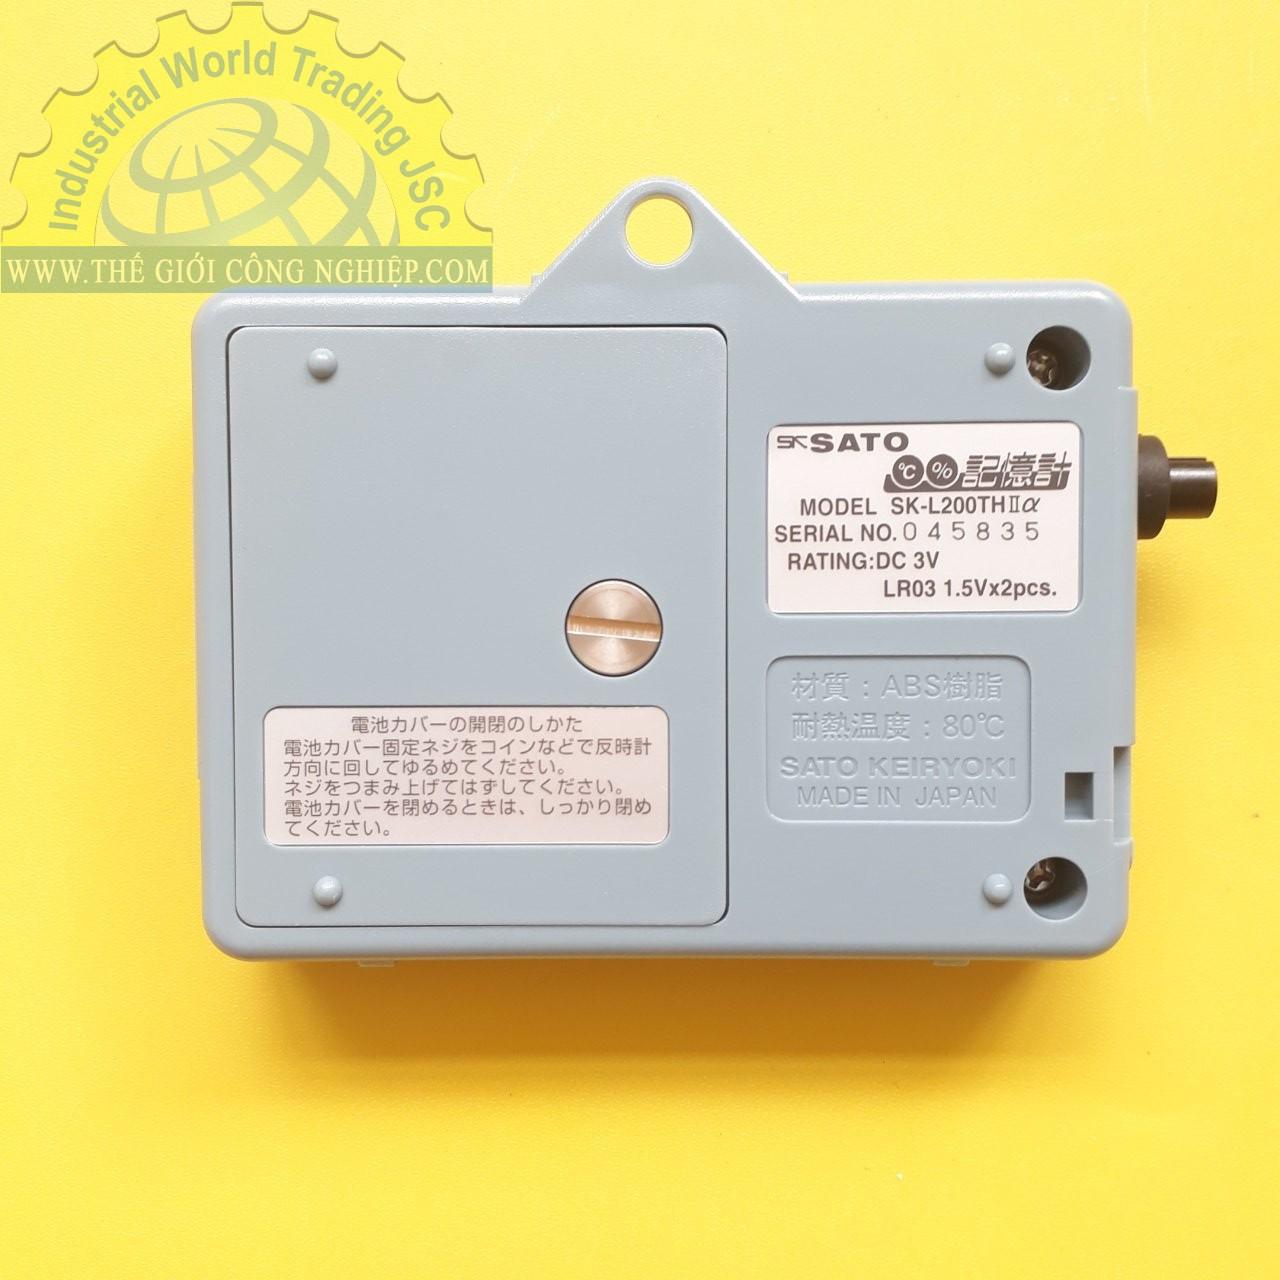 Nhiệt ẩm kế tự ghi -15 đến 65°C datalogger model SK-L200THII Alpha (Main Unit) -15 to 65.0°C SK-L200THIIα No.8175-00 SATO